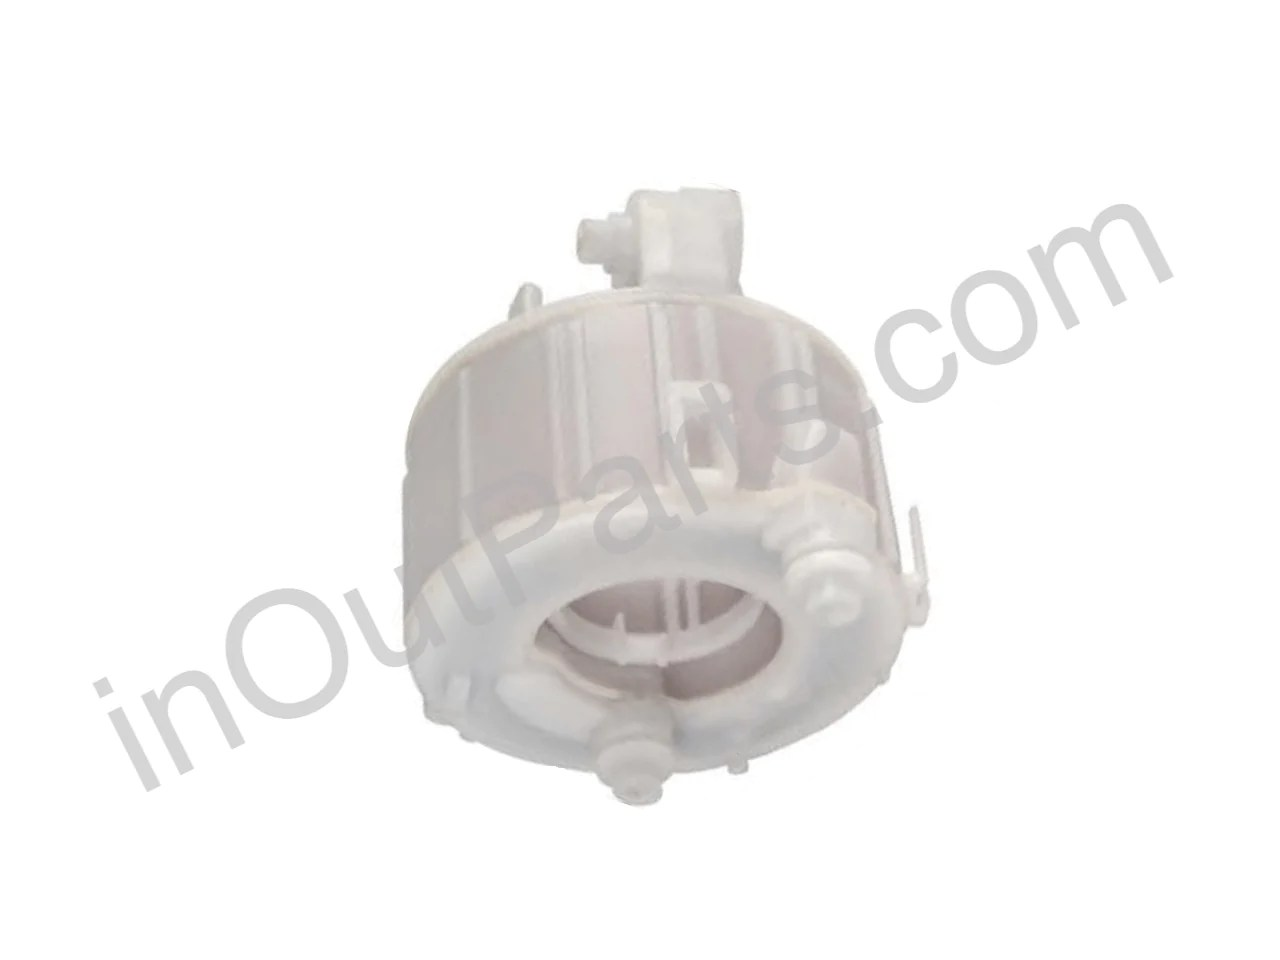 hight resolution of  fuel filter fits kia rio 2010 2016 sorento 2009 2016